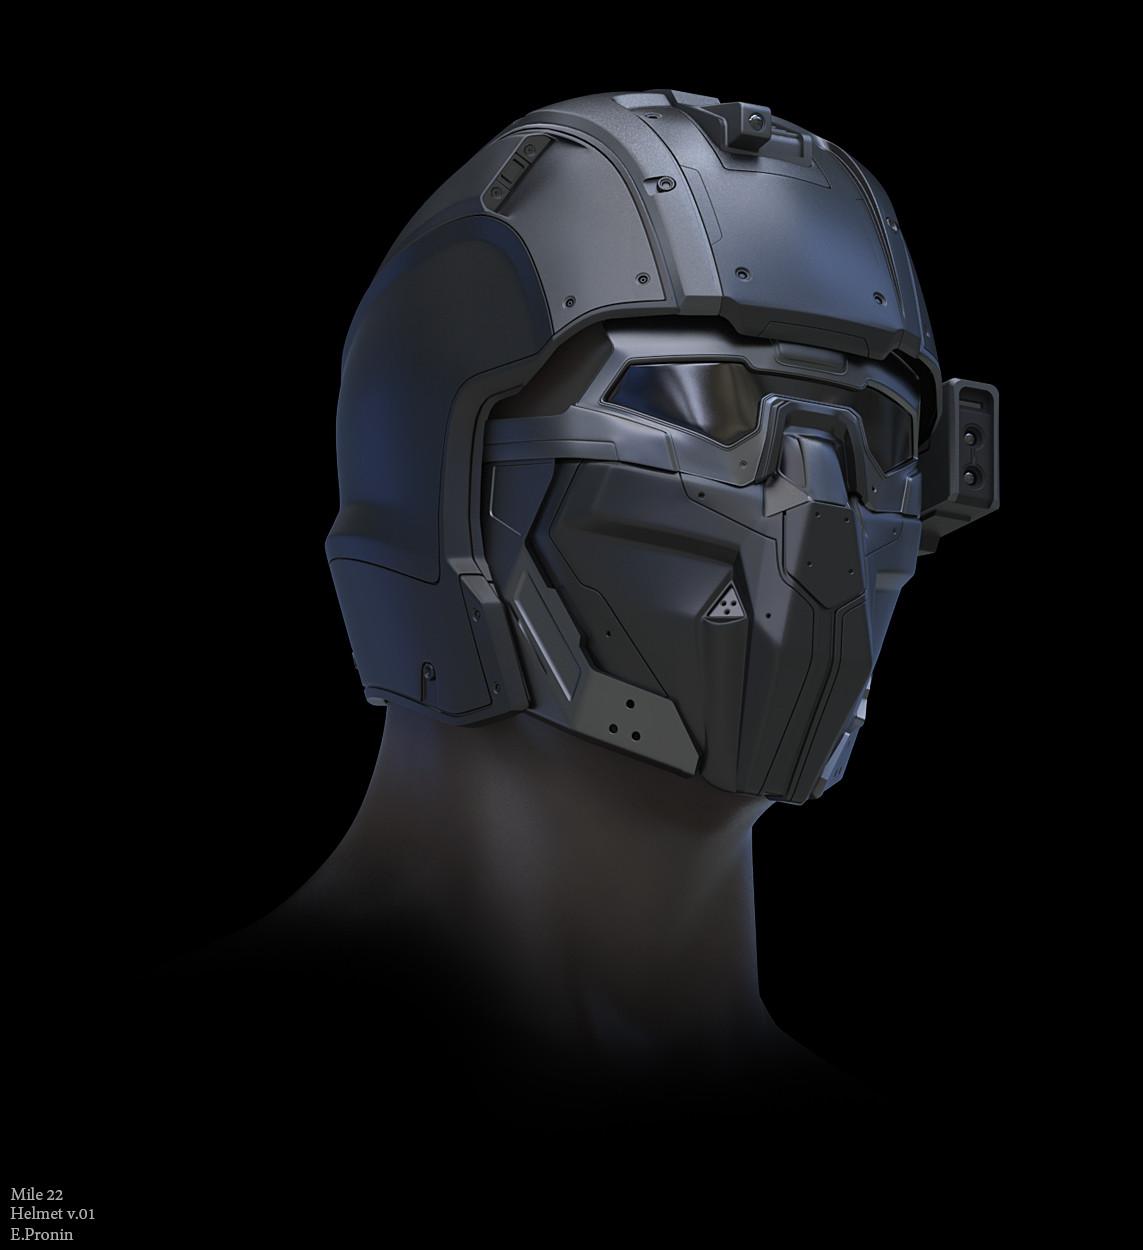 Eduard pronin mile22 helmet concept 03